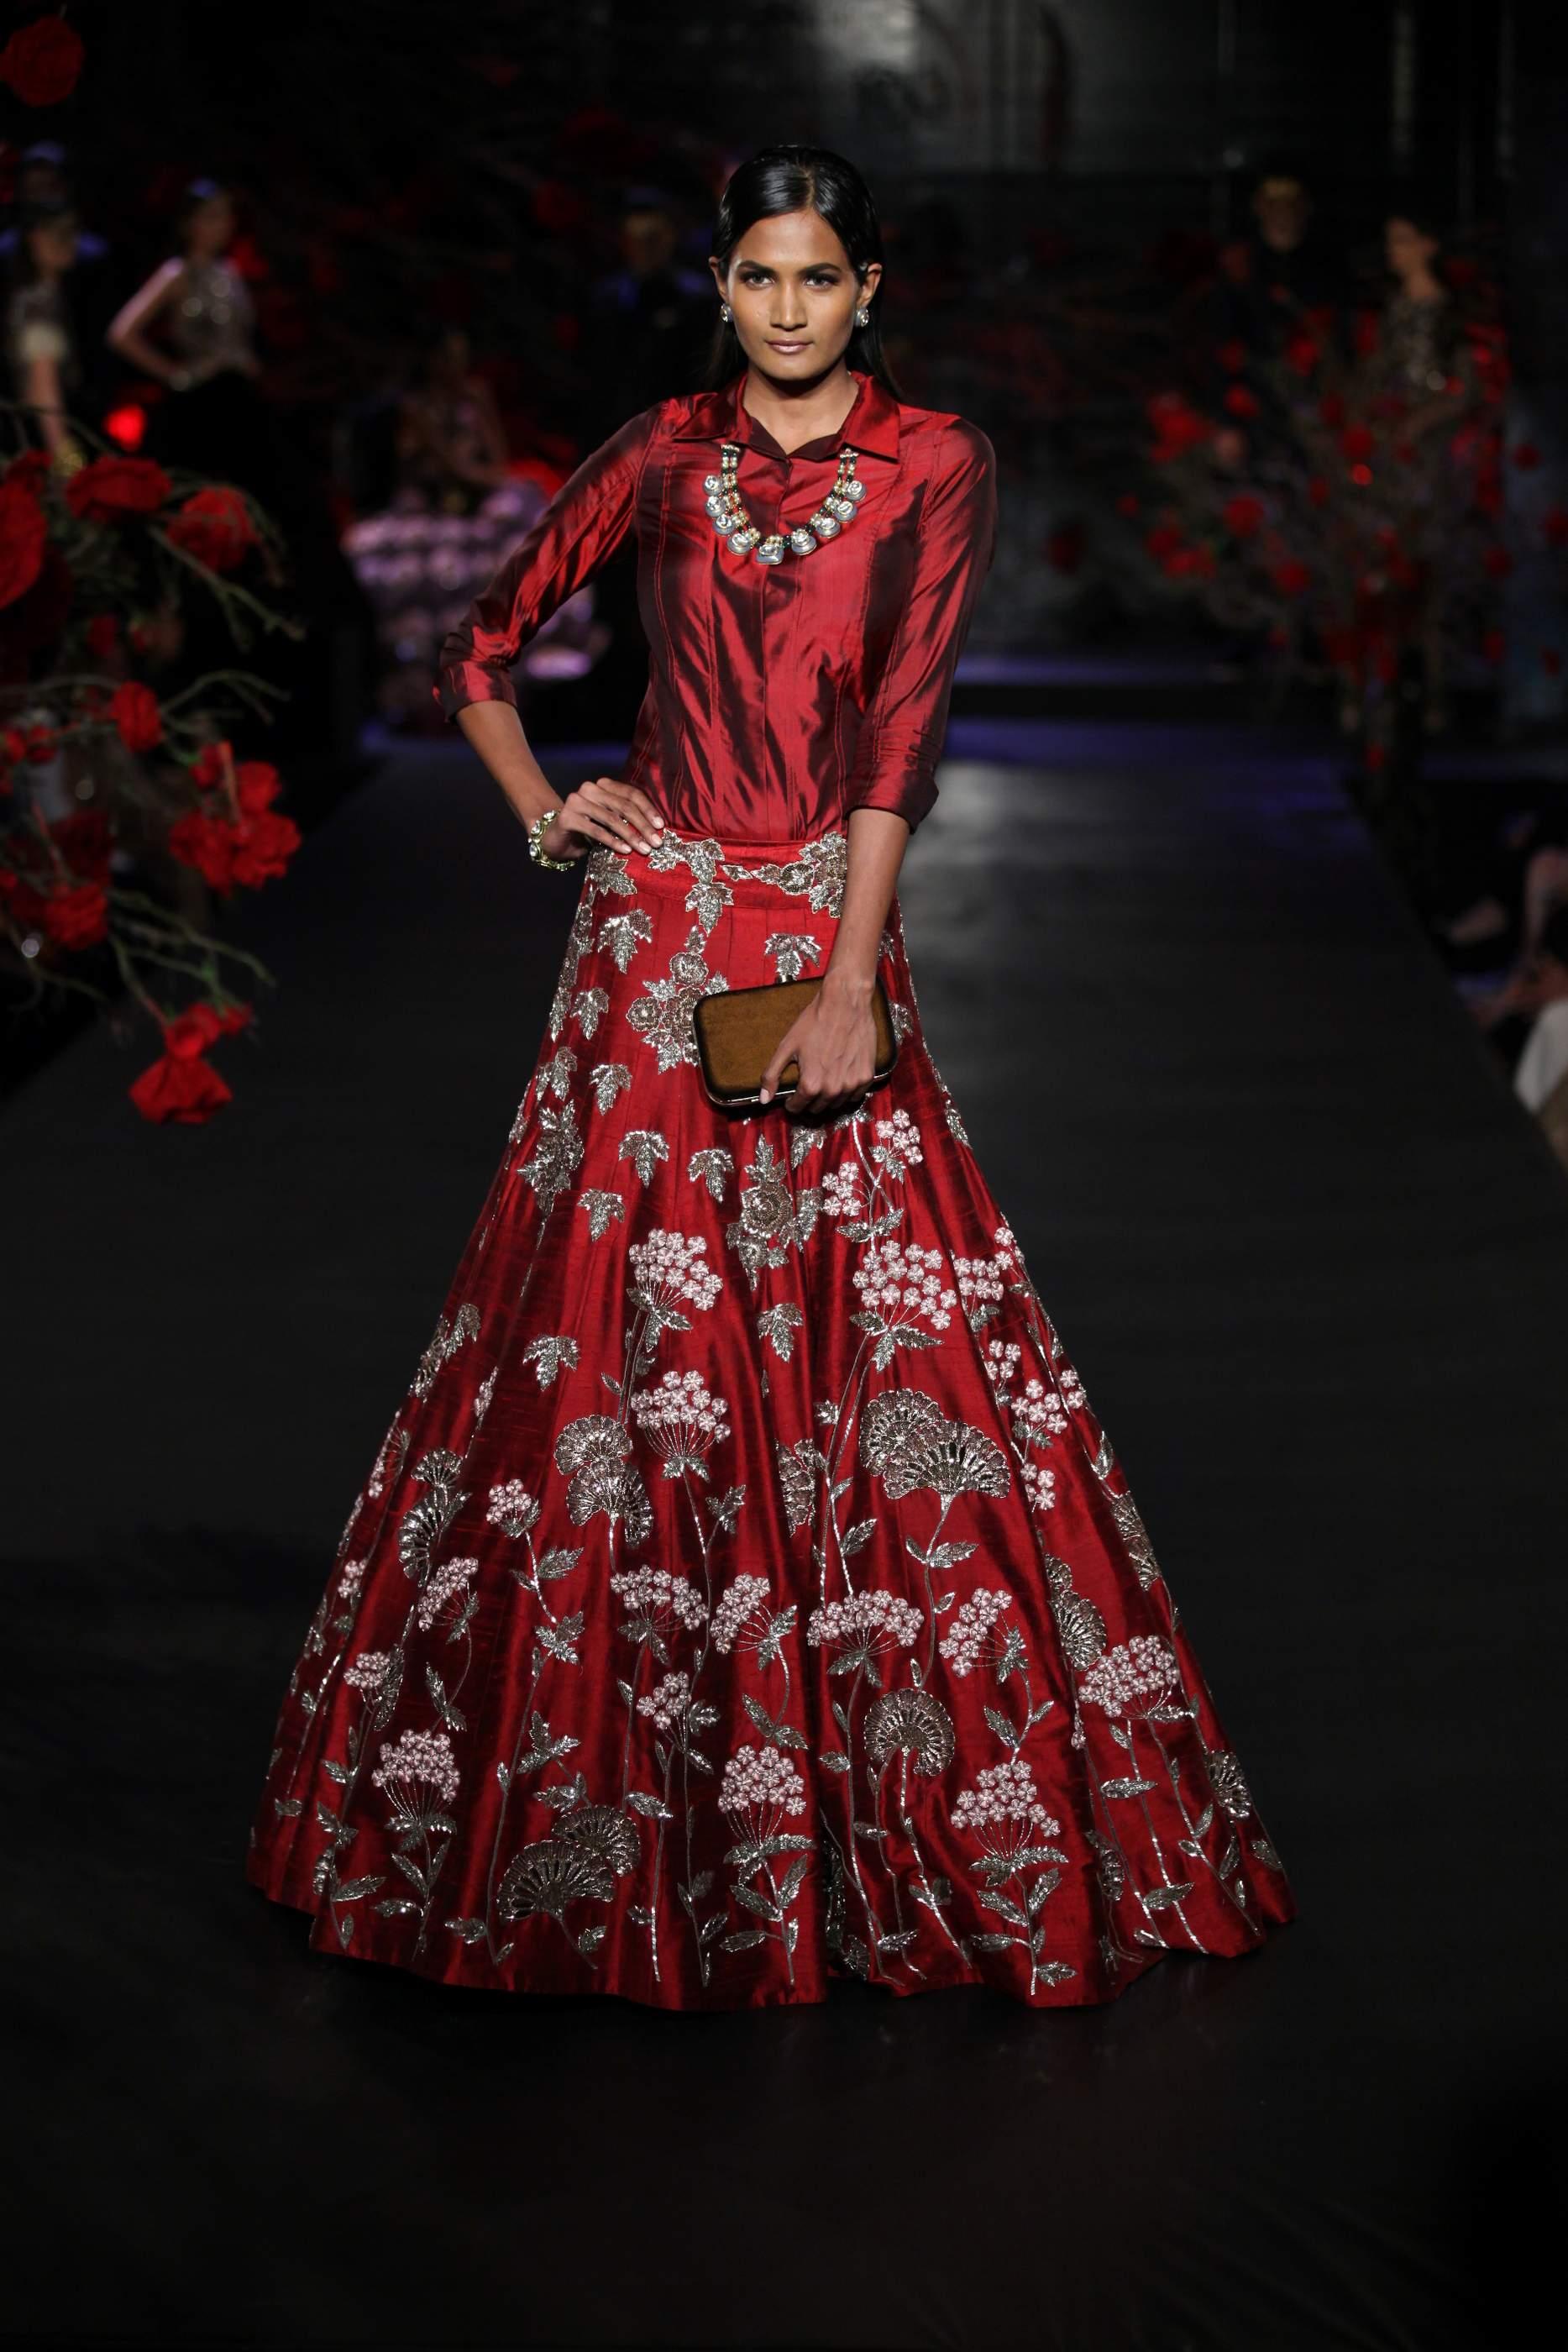 manish malhotra indian aashni presents designer clothes latest designs stocks anamika desirable edit most panachehautecouture